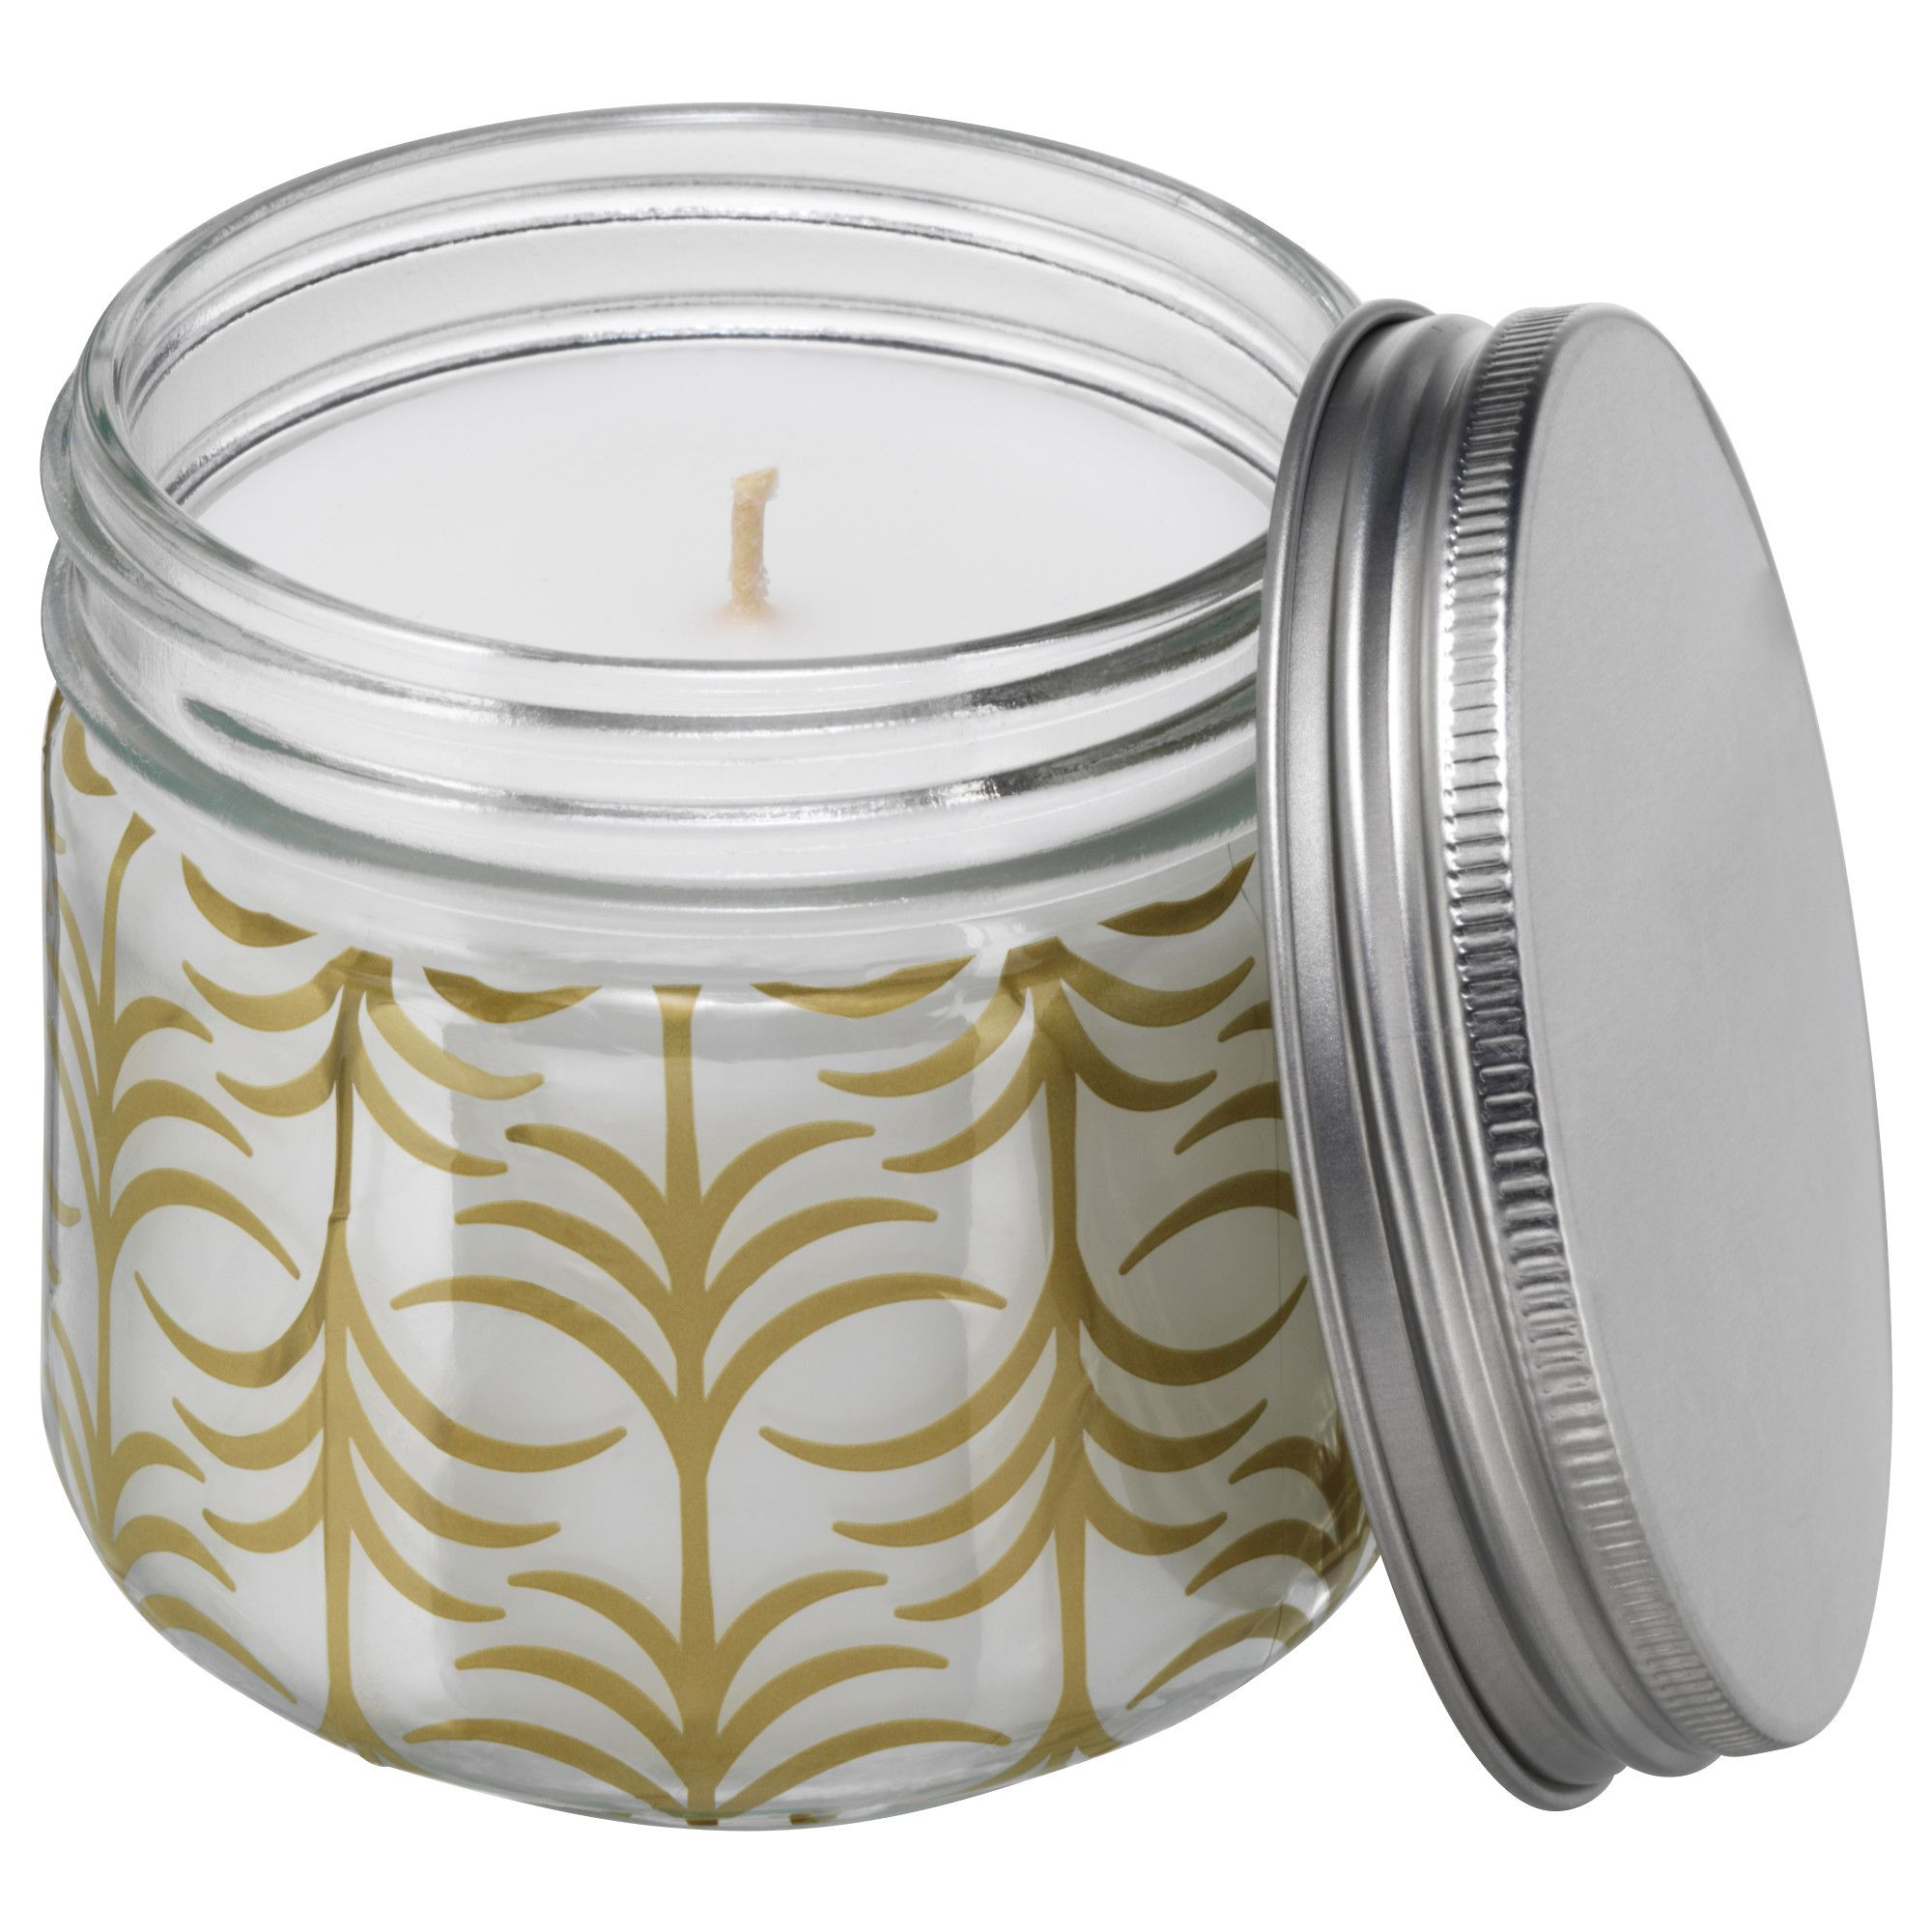 Ikea Kerzen Im Glas förlika duftkerze im glas goldfarben jetzt bestellen unter https